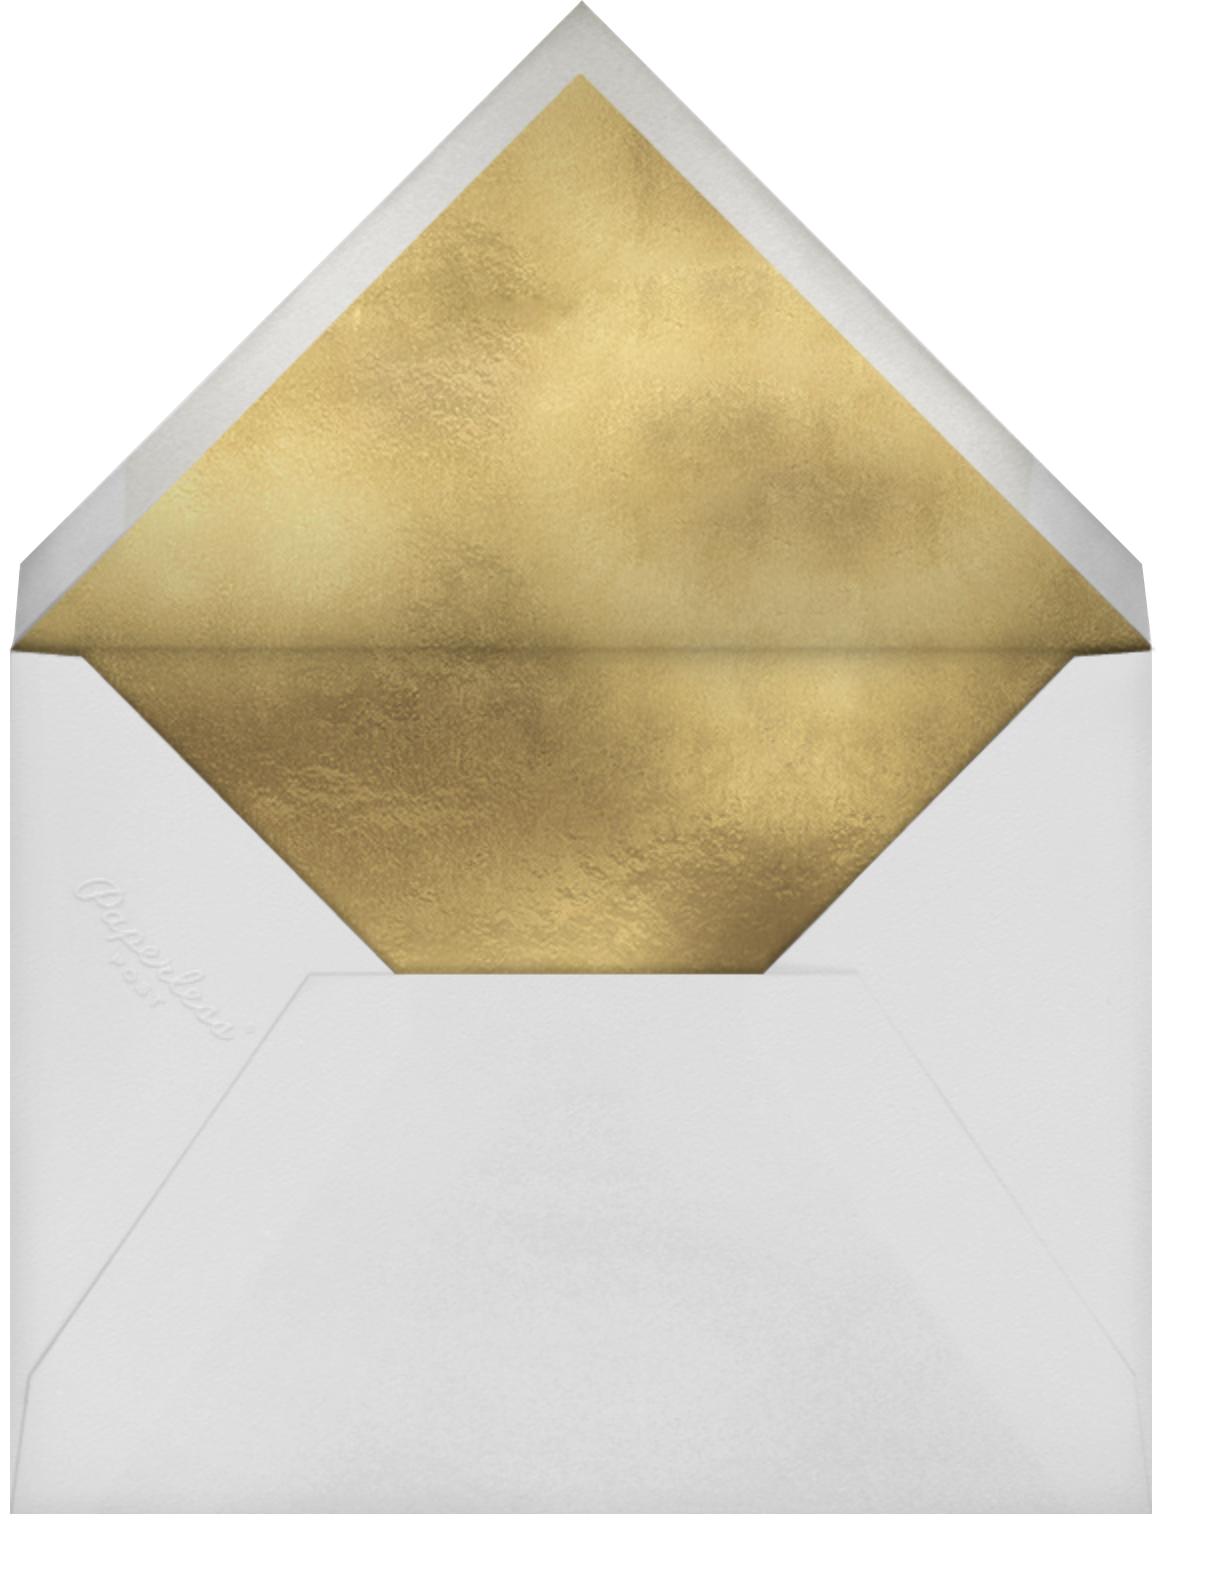 Sand Garden - Gold - kate spade new york - Professional events - envelope back